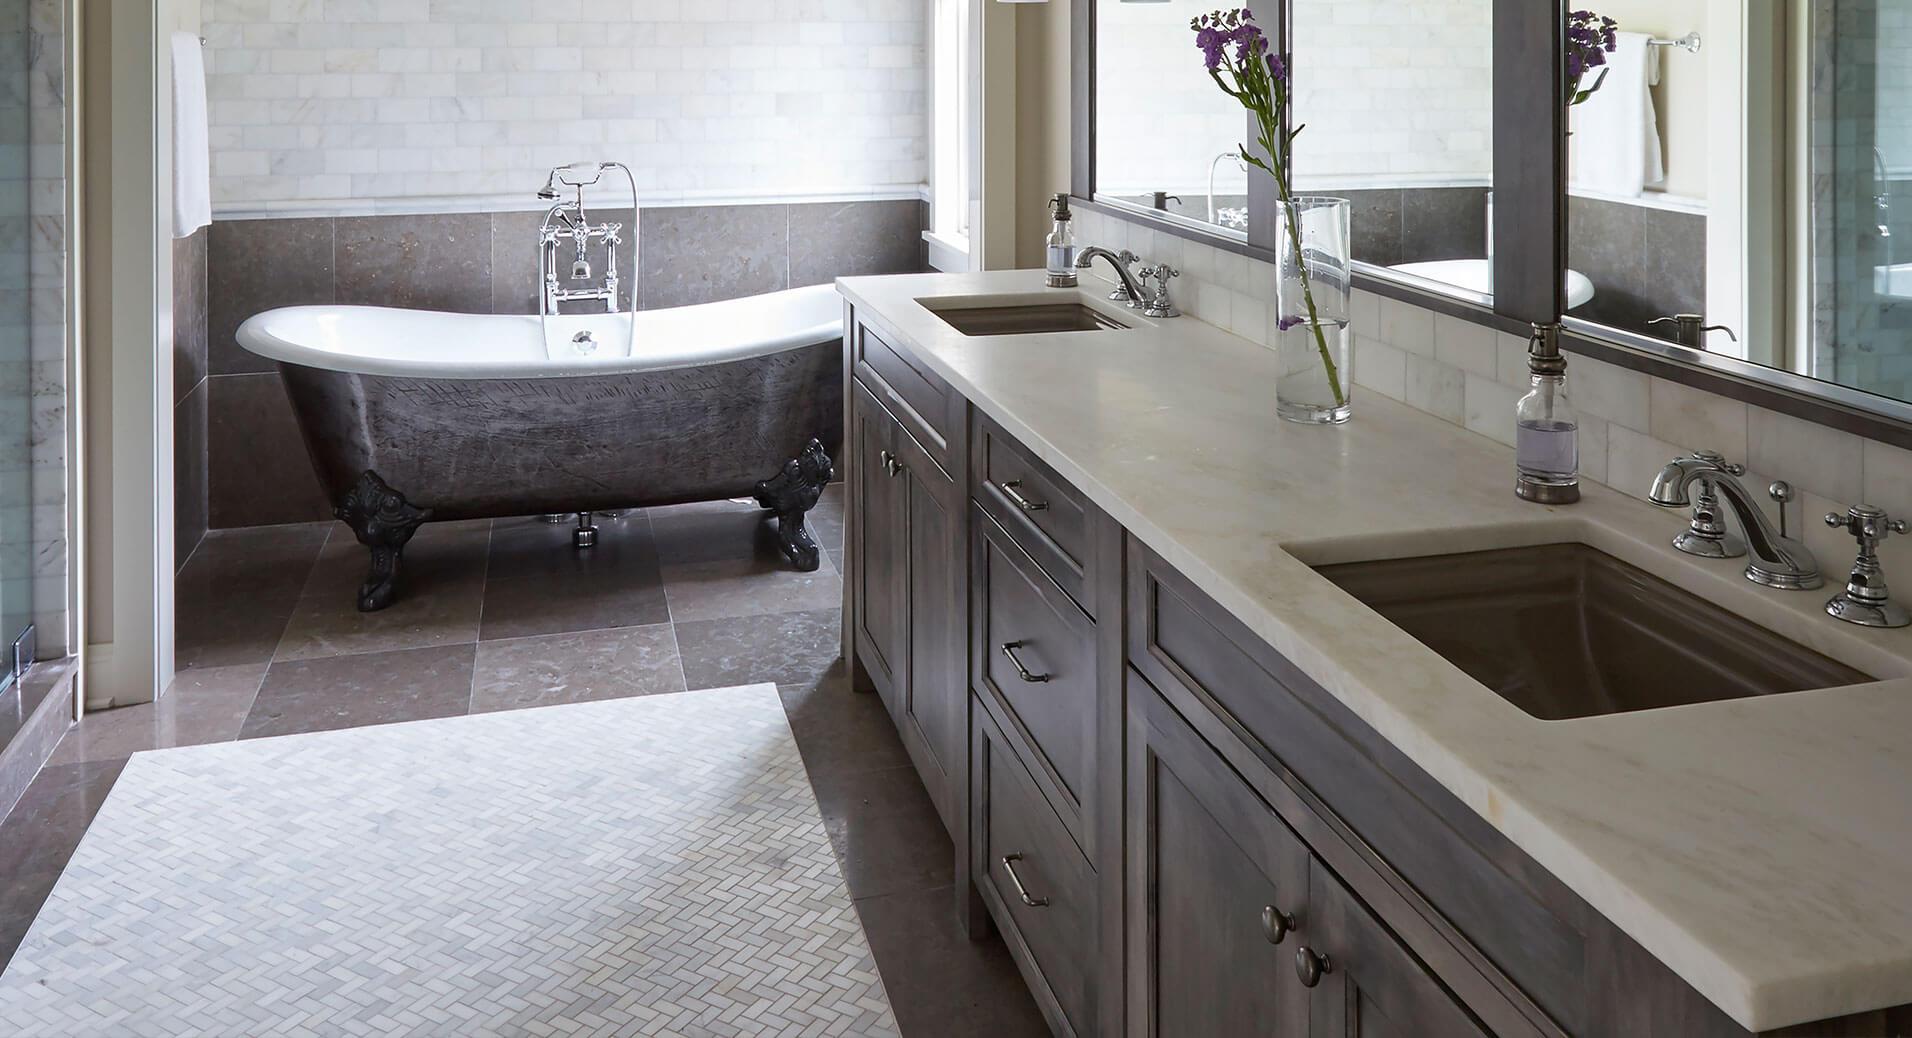 Kitchen Amp Bathroom Cabinets Woodharbor Custom Cabinetry